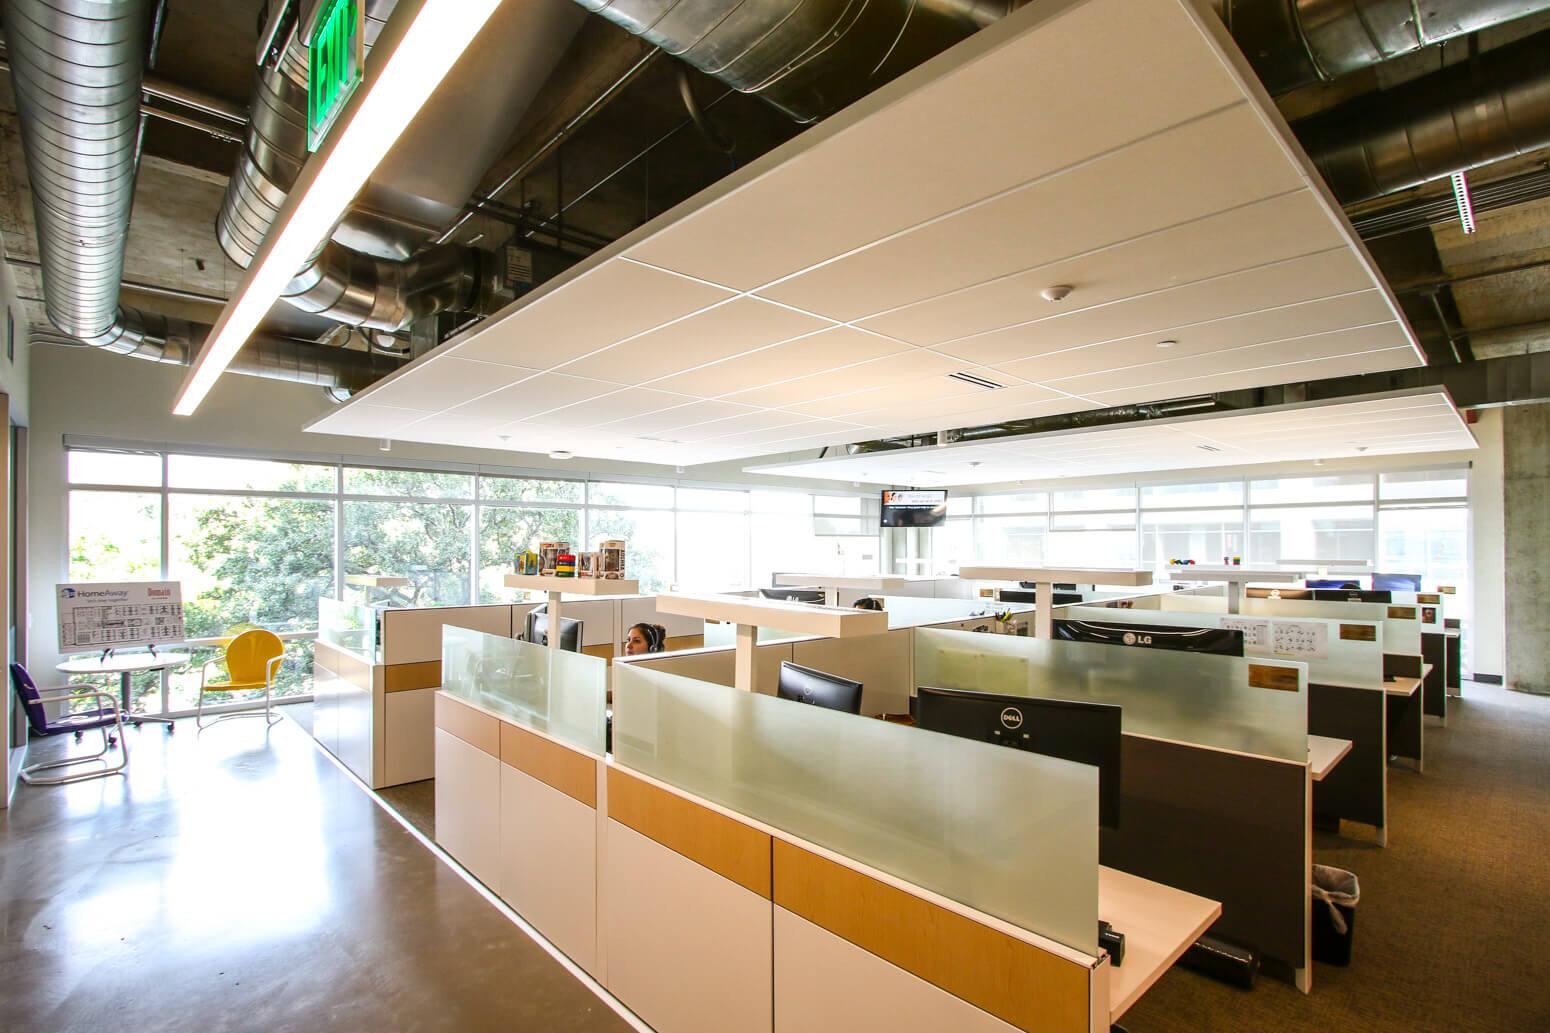 HomeAway Austin Office Killer Spaces-20